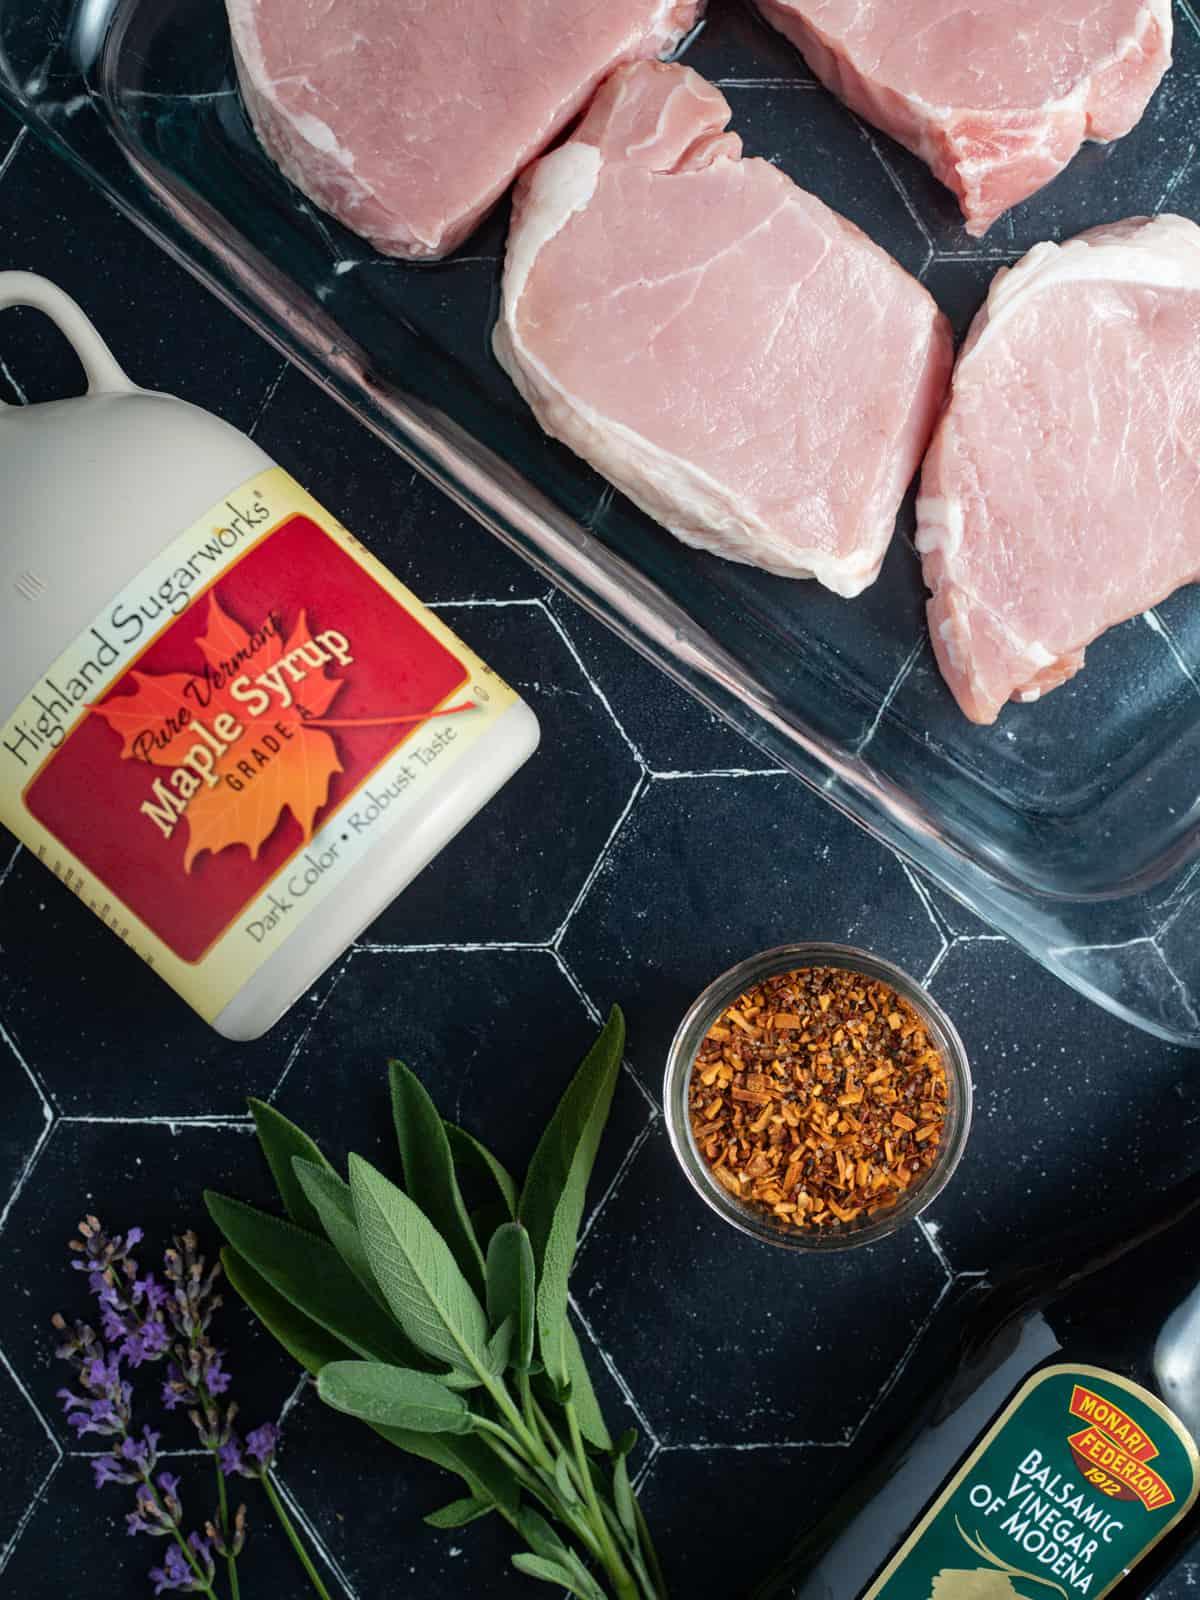 pork chops, maple syrup, grill seasoning, herbs and balsamic vinegar